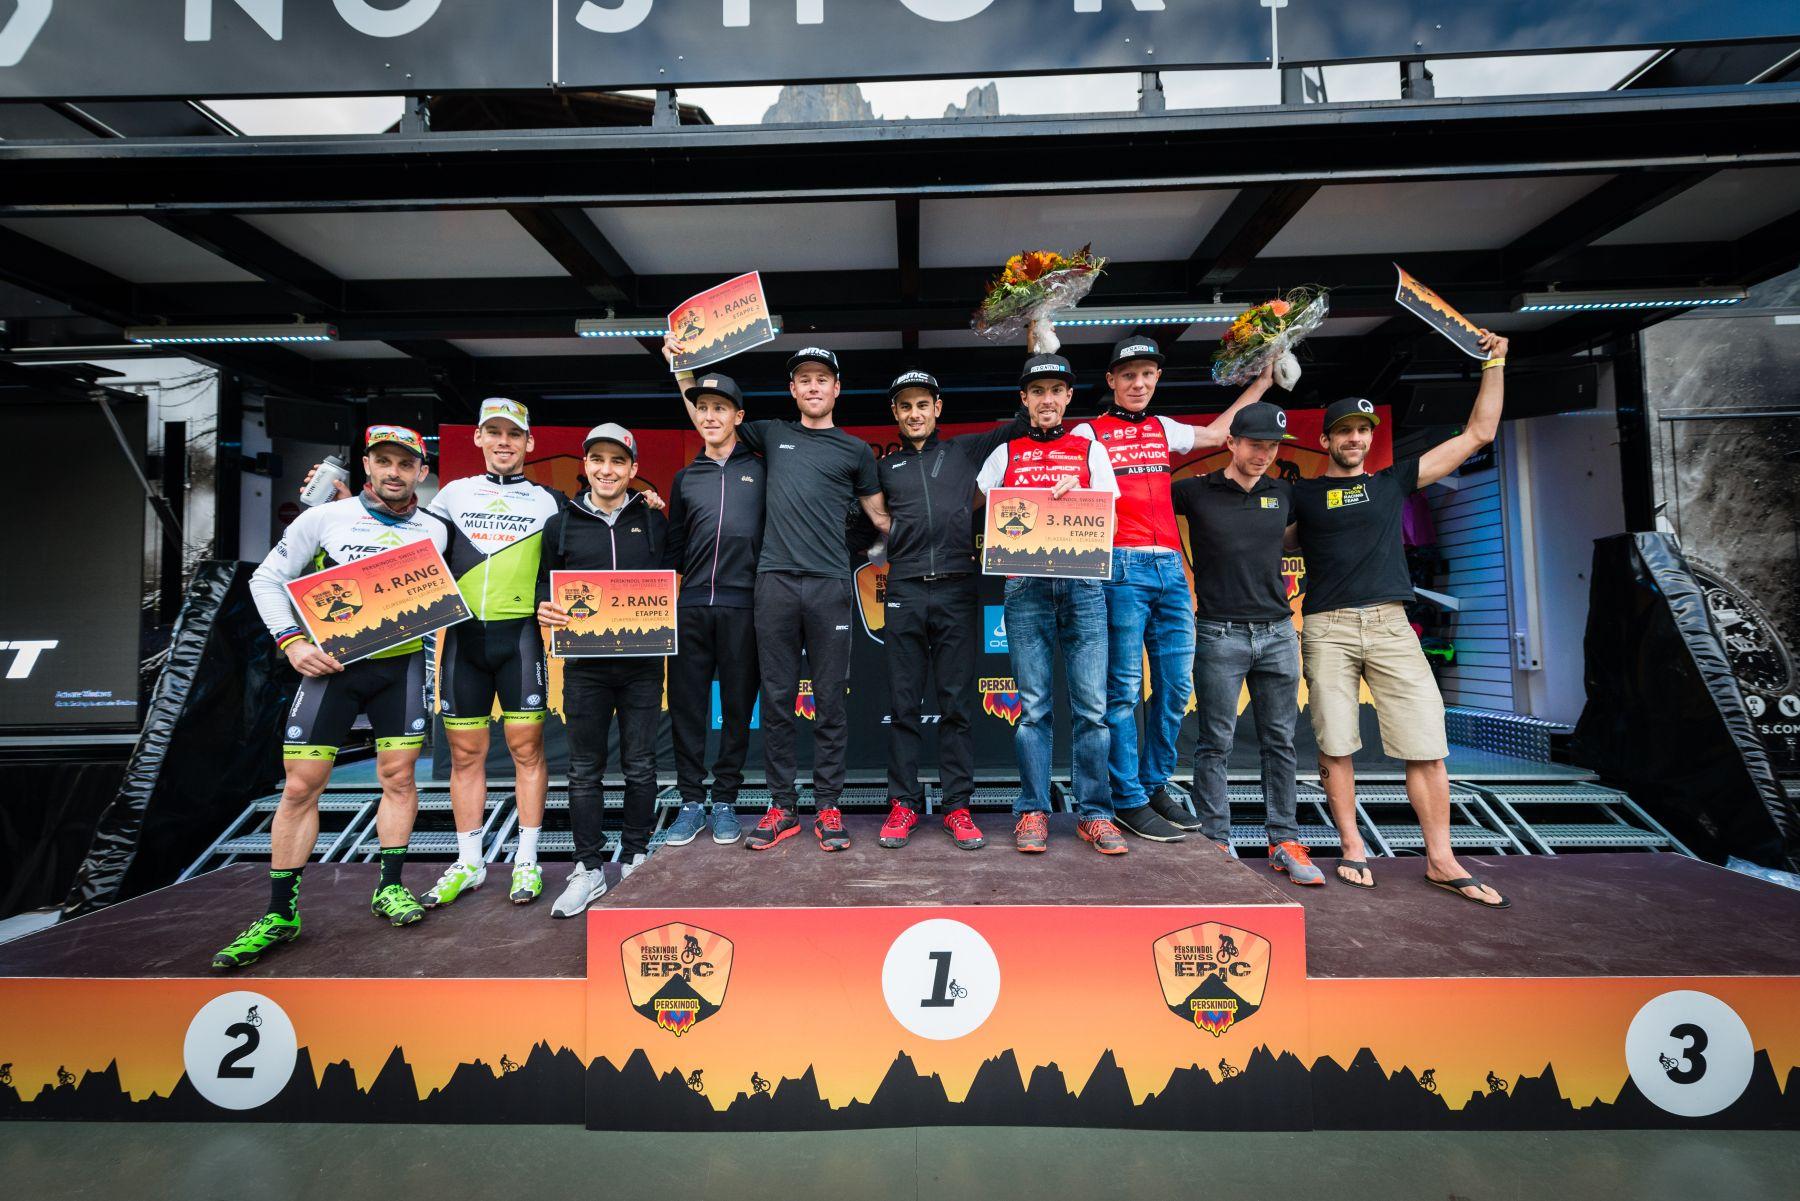 El podio de la etapa.